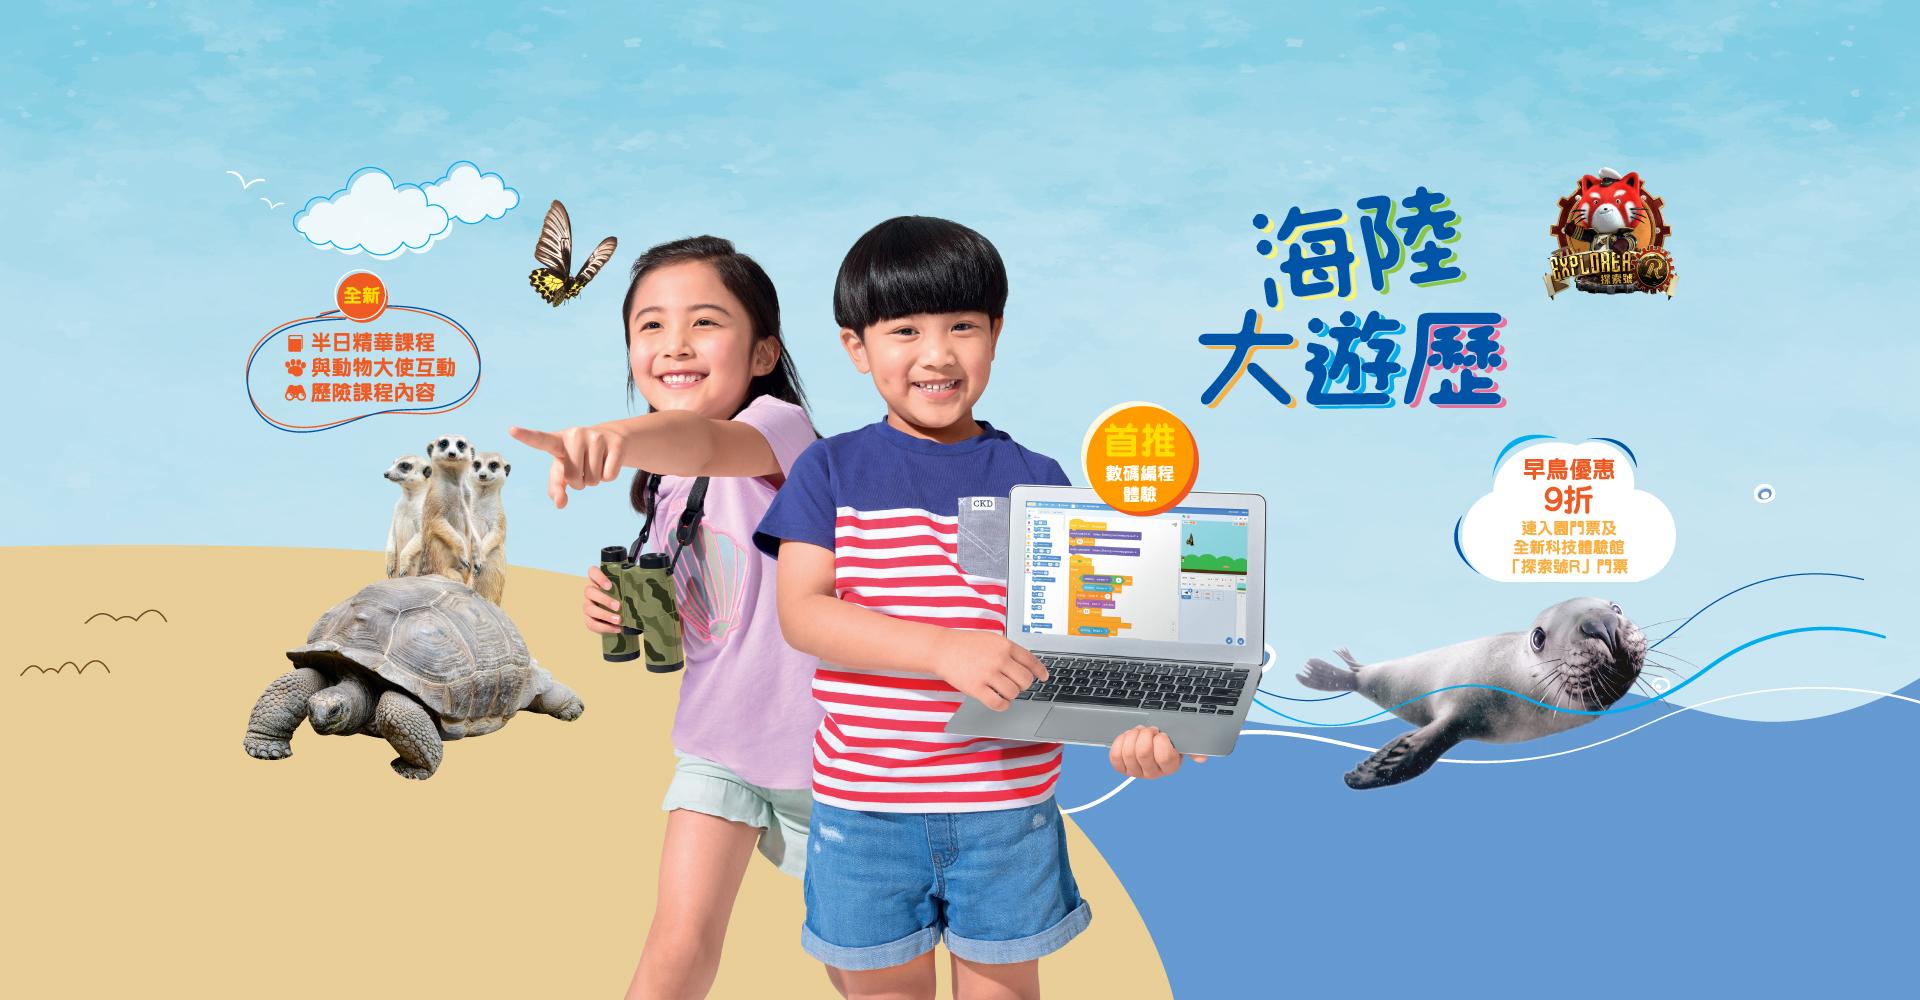 https://media.oceanpark.com.hk/files/s3fs-public/op-summercamp-inside-desktop-tc.jpg